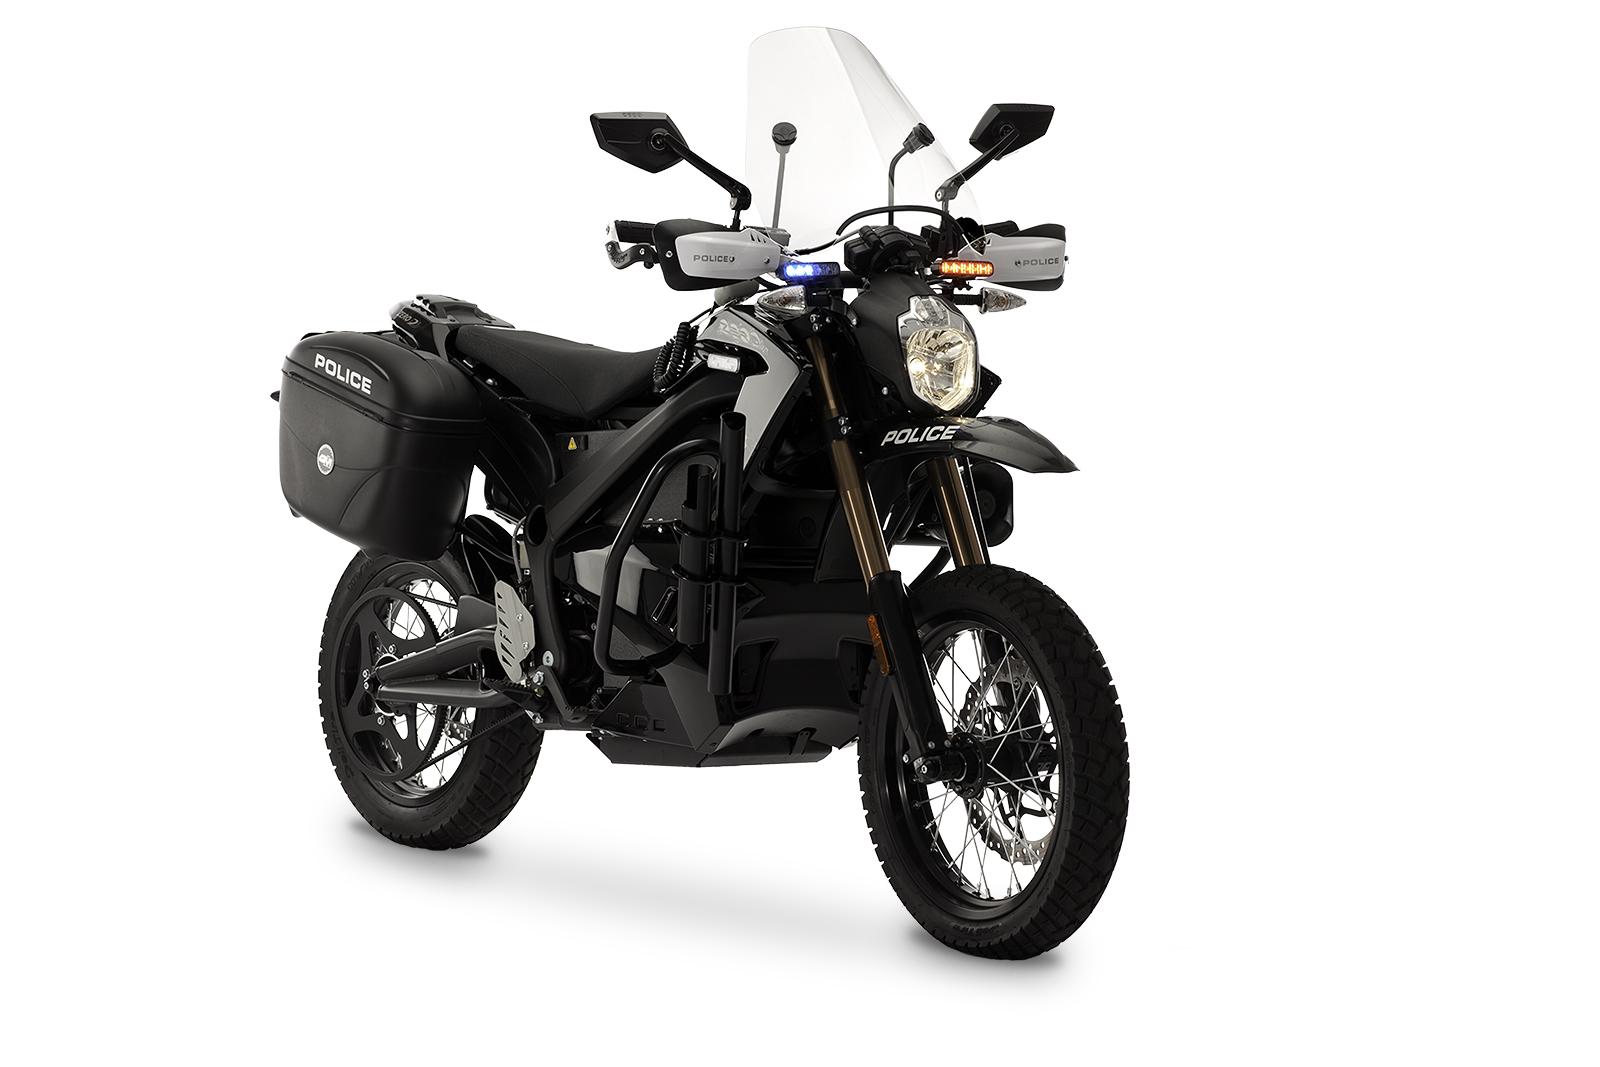 2012 Zero DS Police Motorcycles: Angle Left